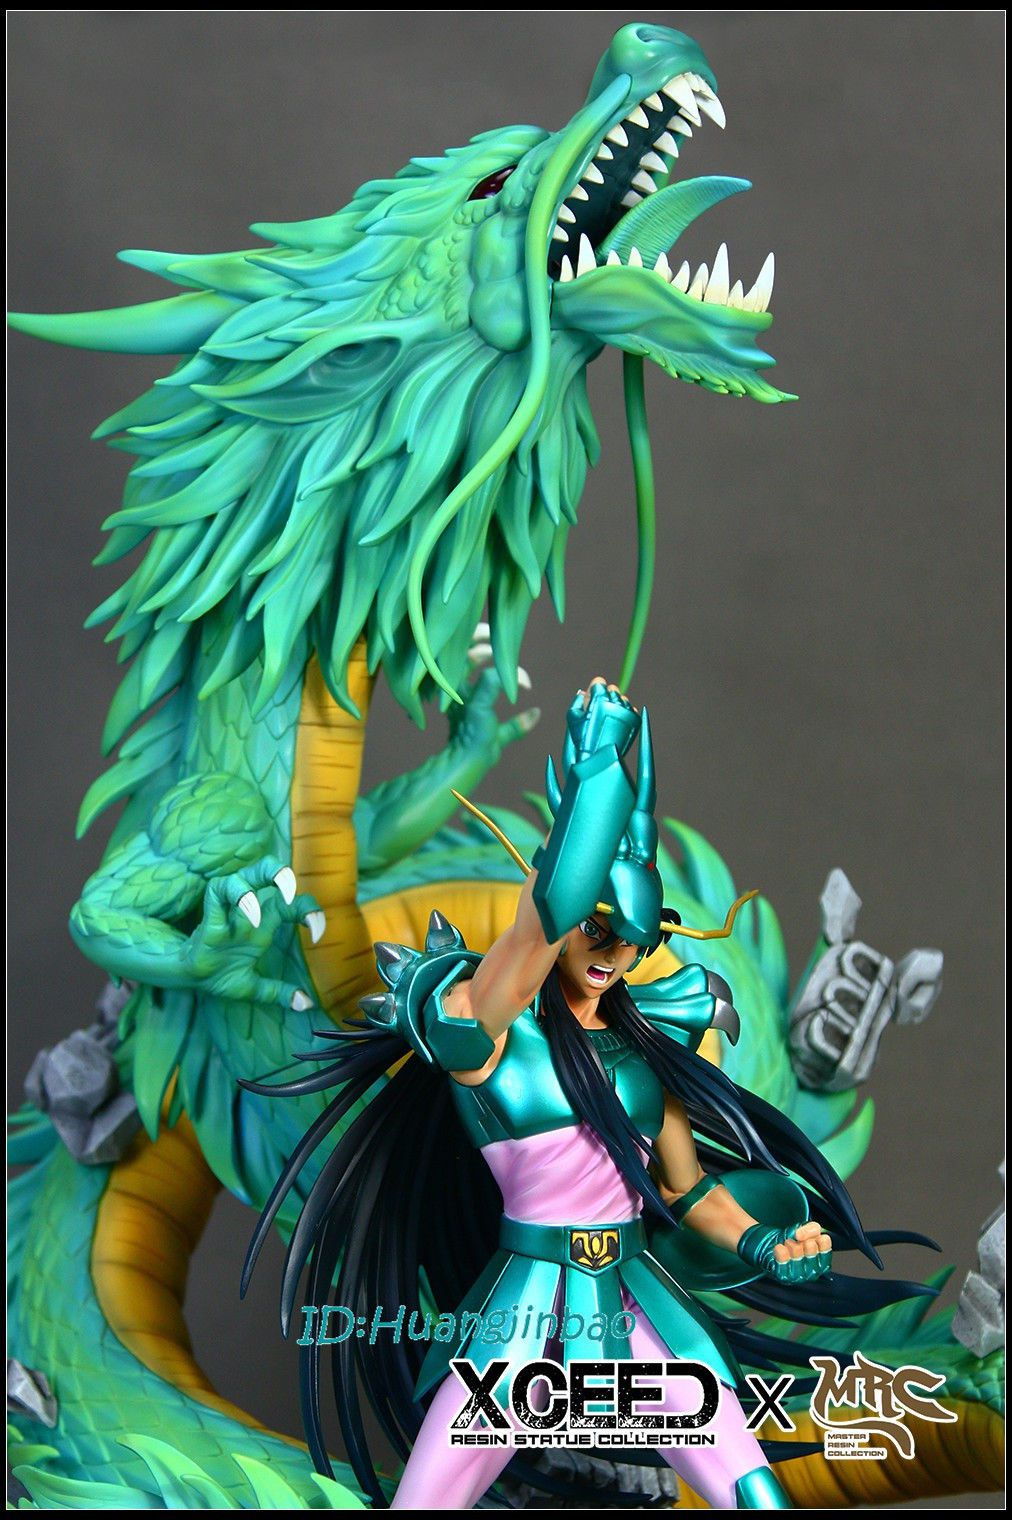 Estátua Shiryu de Dragão: Os Cavaleiros do Zodíaco (Saint Seiya) Escala1/6 - Xceed